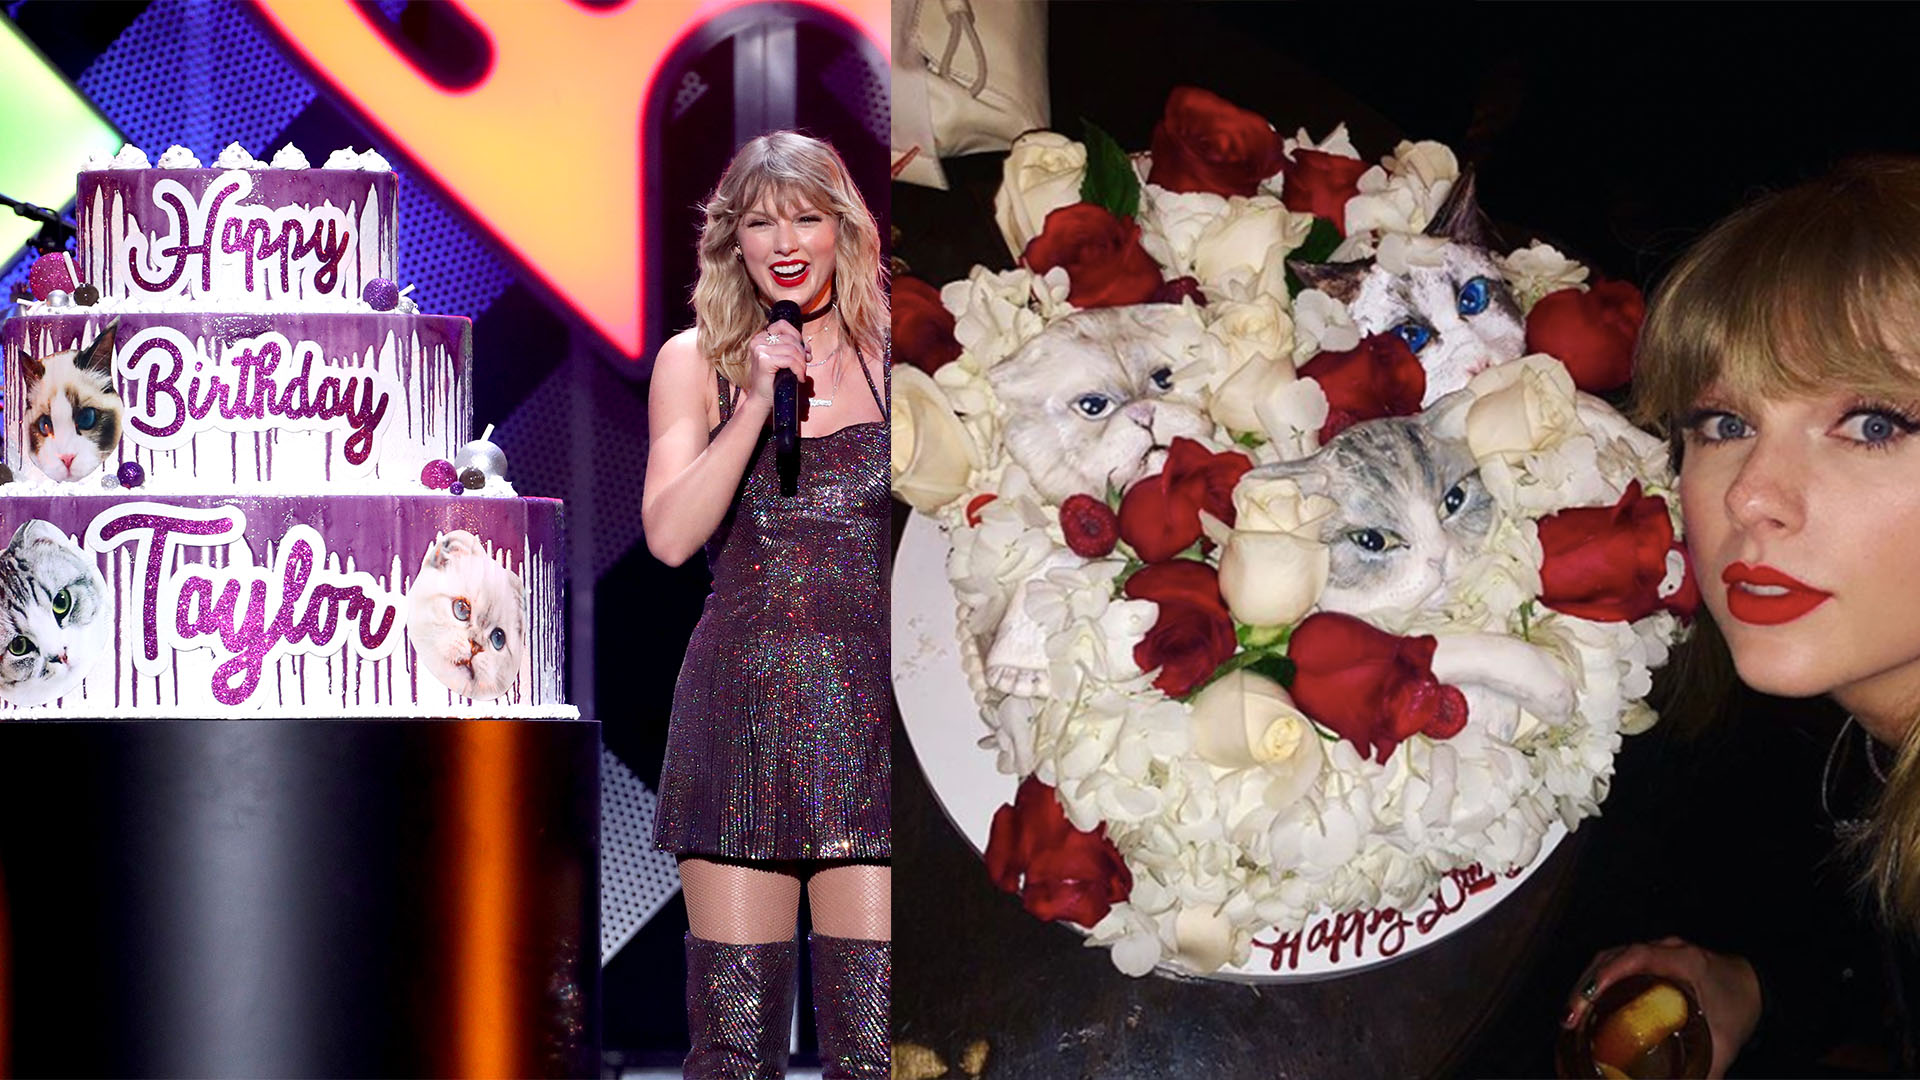 Amazing Taylor Swifts Birthday Cake Is Both Cute And Concerning Funny Birthday Cards Online Inifodamsfinfo